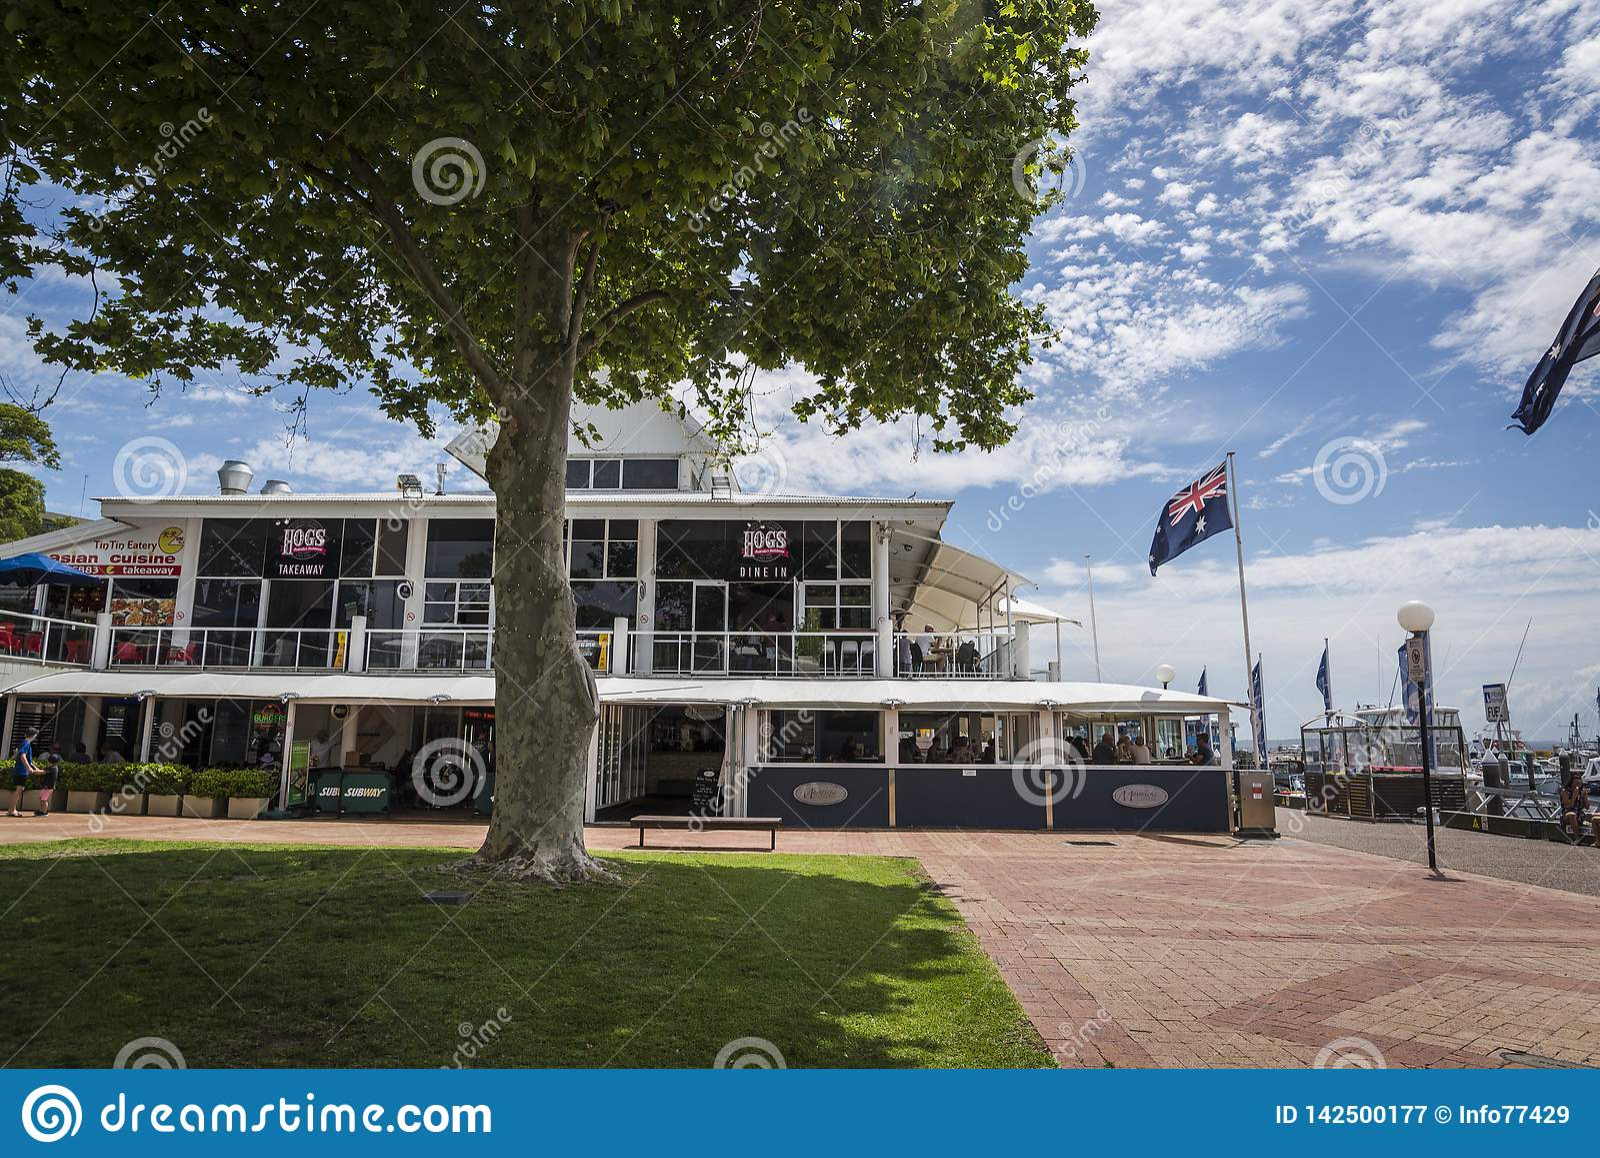 Steakhouse van Australië van het varken, Nelson Bay, NSW, Australië